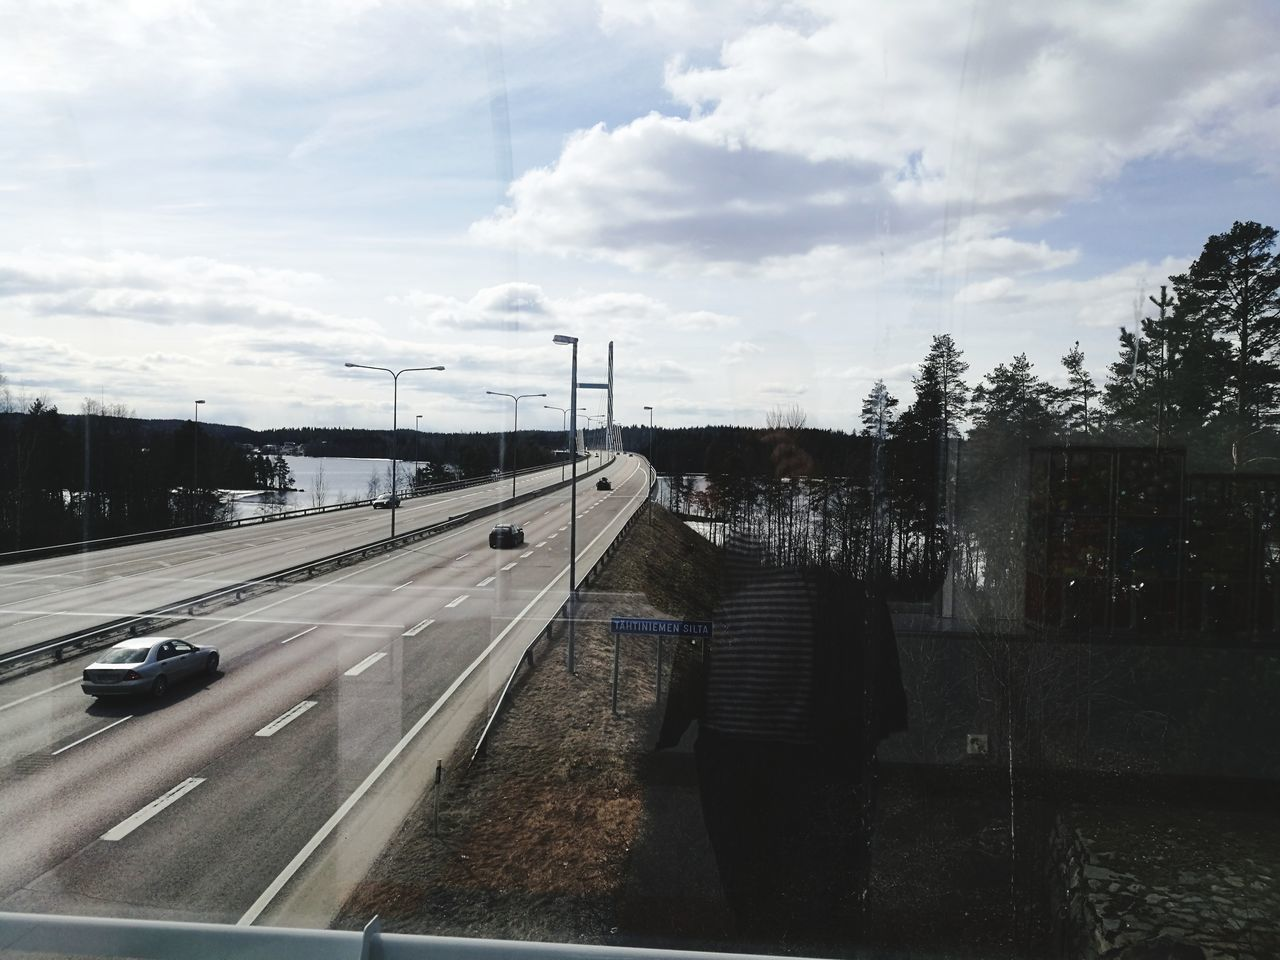 Finland♥ Finlandlovers Finlandia Finland_photolovers Helsinki, Finland. Finland Finlande Helsinki Vantaa Aéroport Aeroport ✈ Transportation Cloud - Sky Road Street Car Sky Day Outdoors No People Tree City